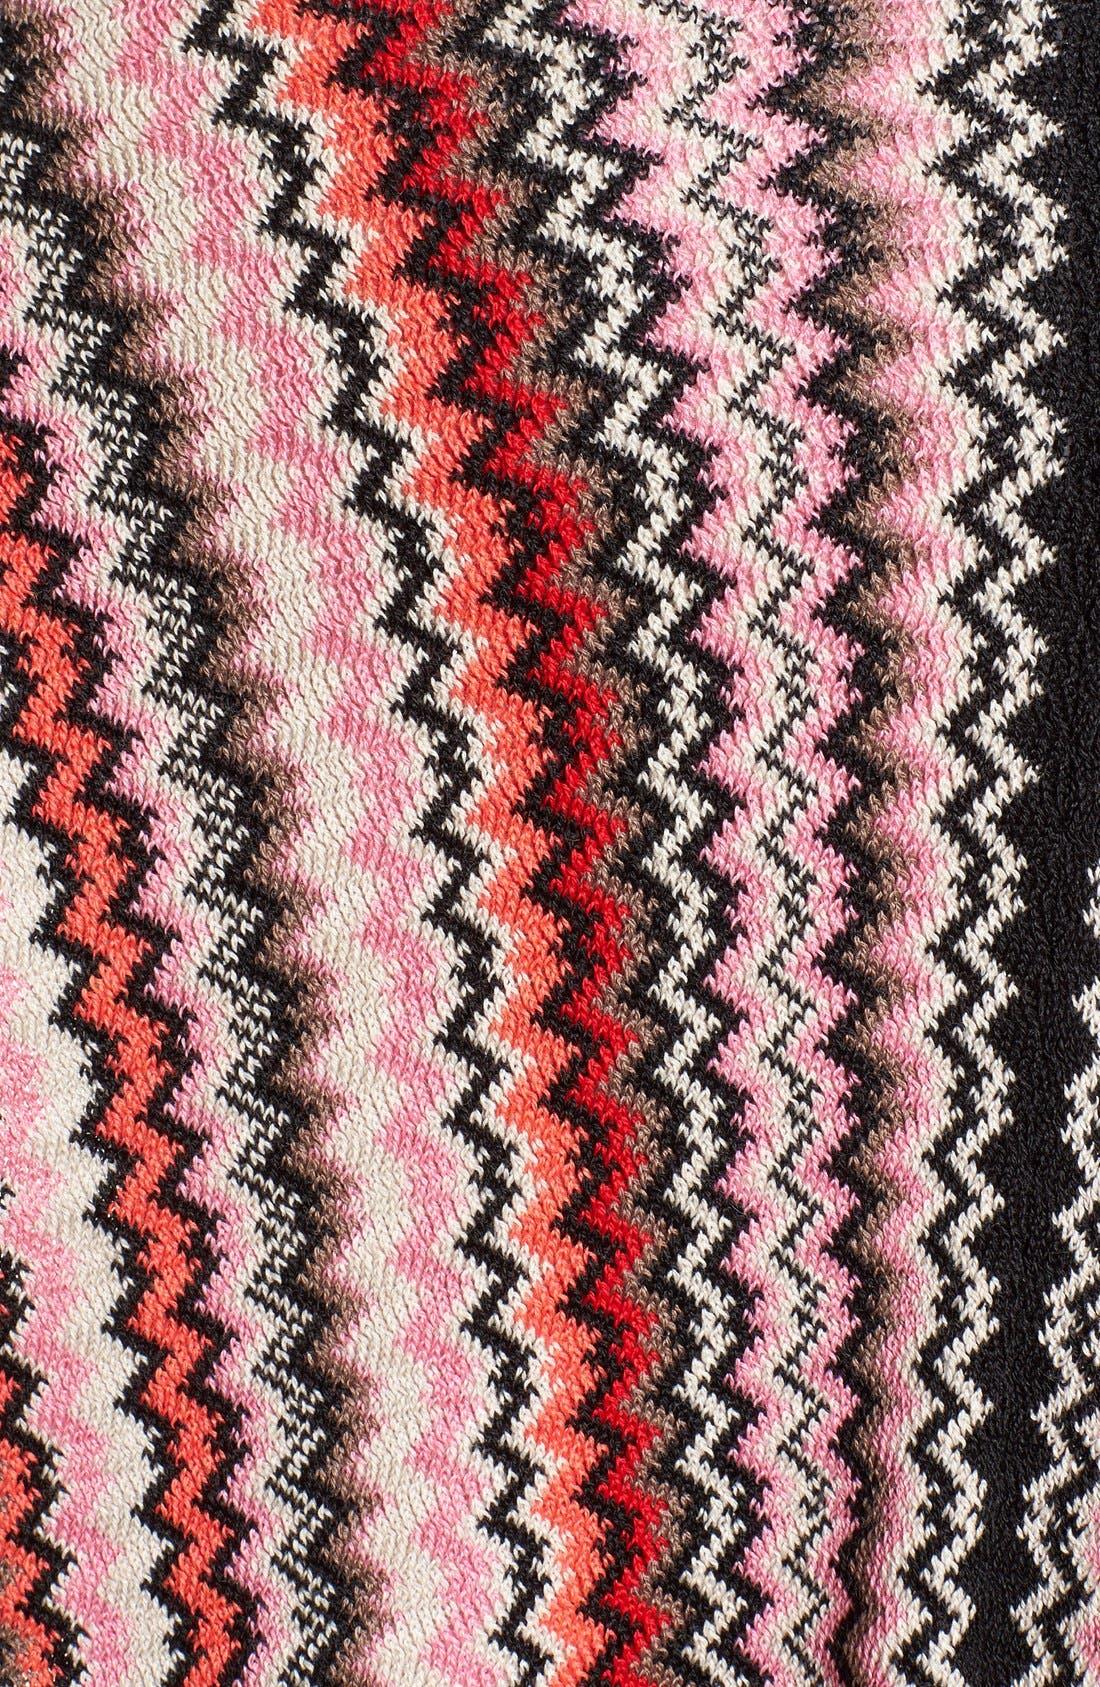 Fringe Zigzag Cape,                             Alternate thumbnail 3, color,                             Red/ Brown/ Pink